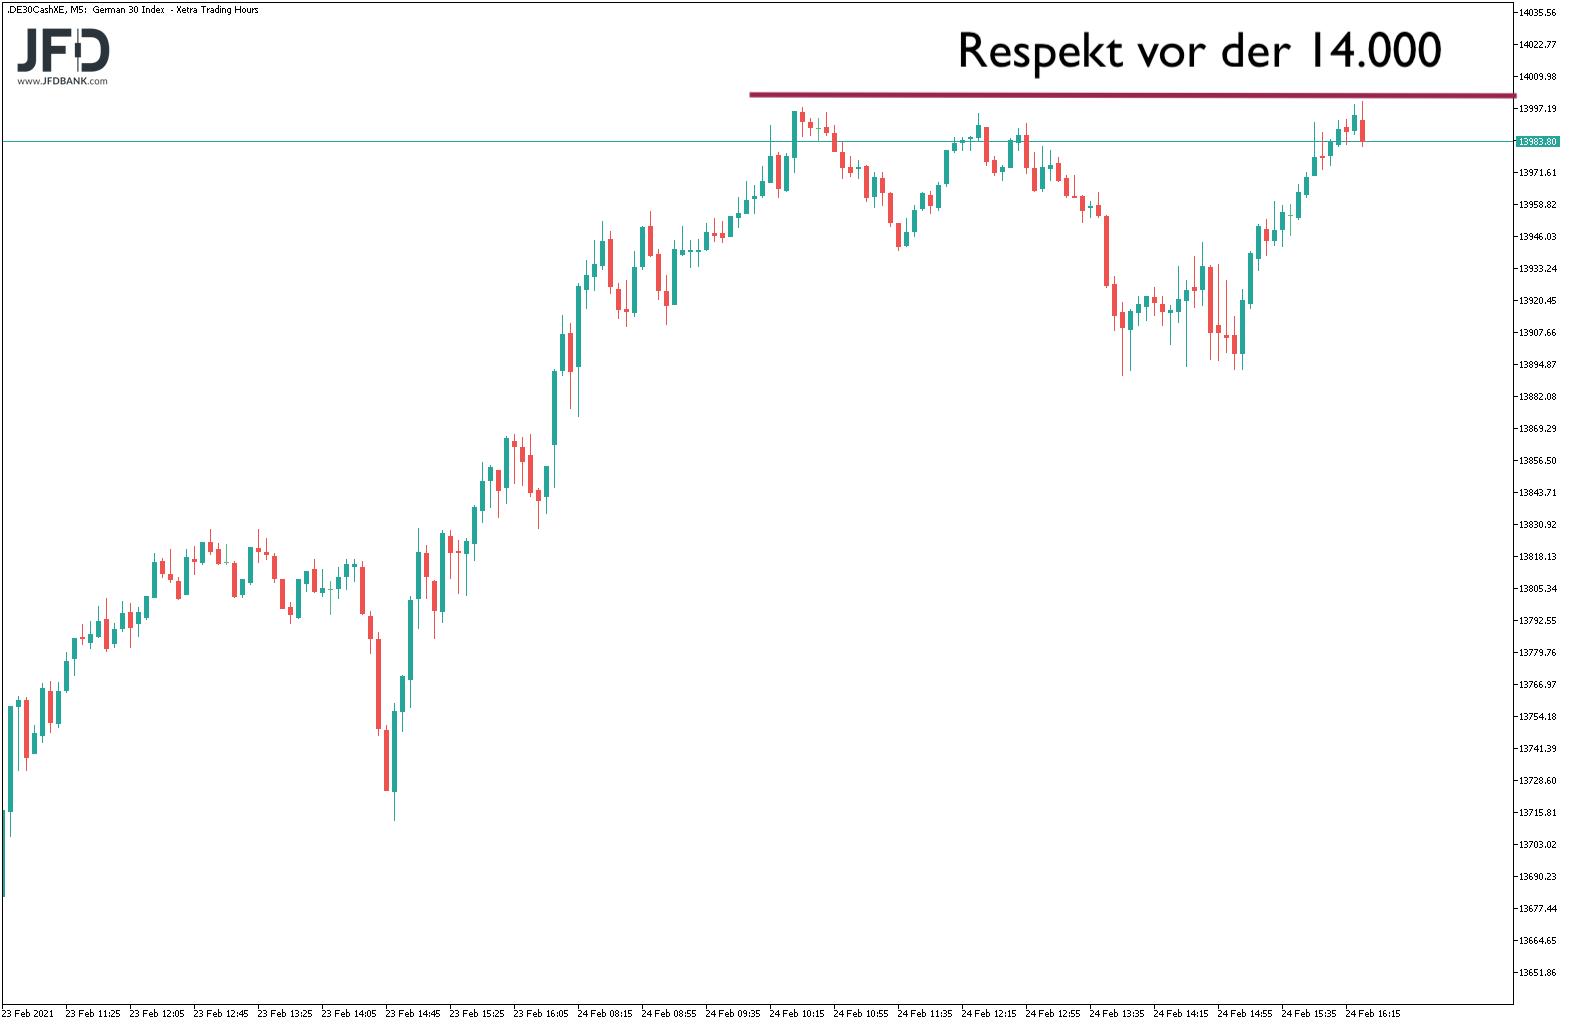 Respekt-vor-der-runden-Marke-im-DAX-Kommentar-JFD-Bank-GodmodeTrader.de-2